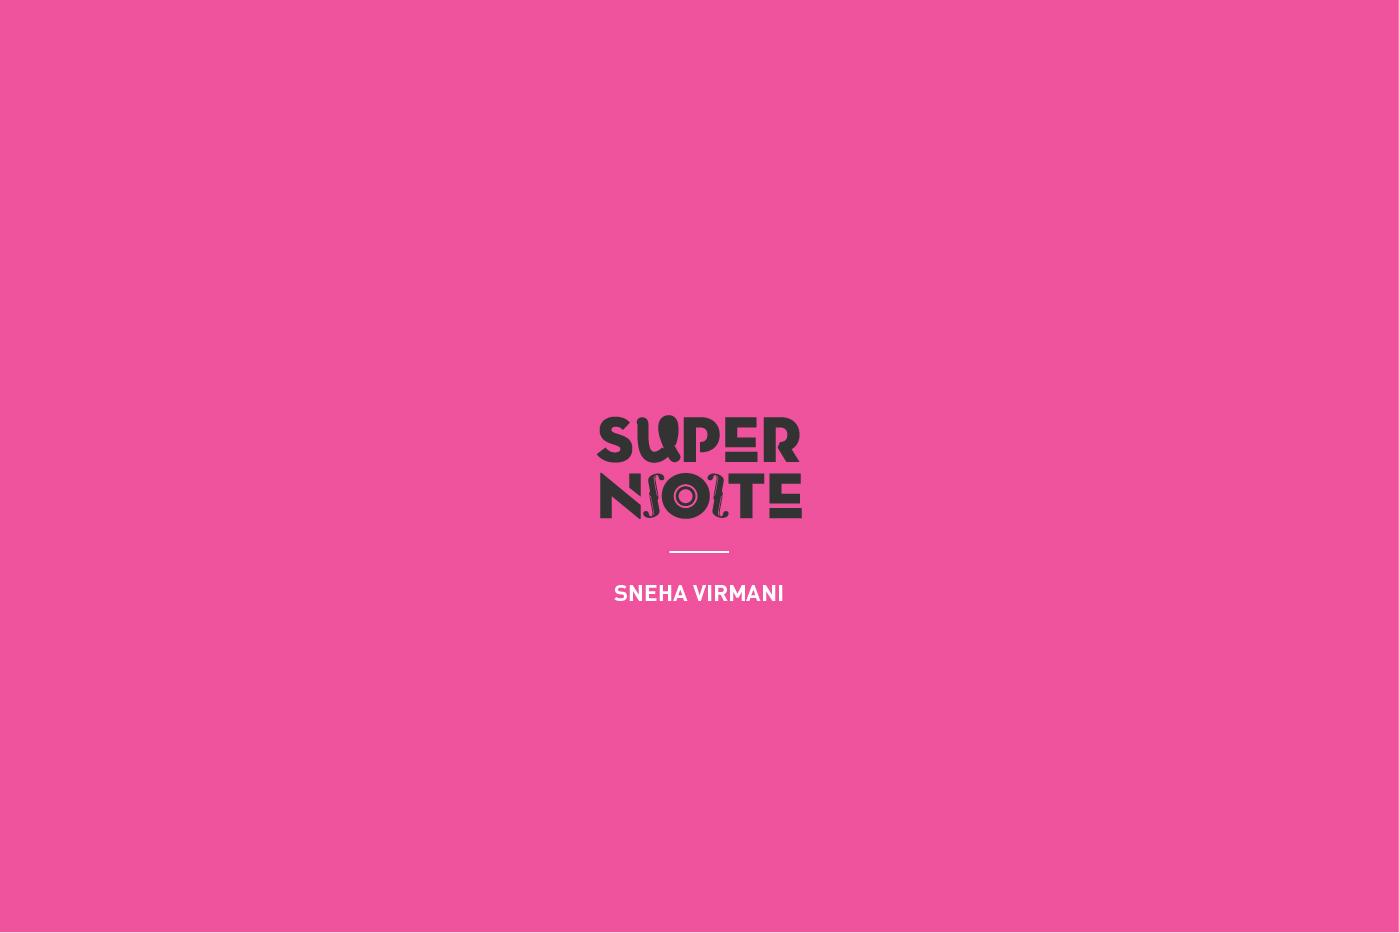 supernote-11